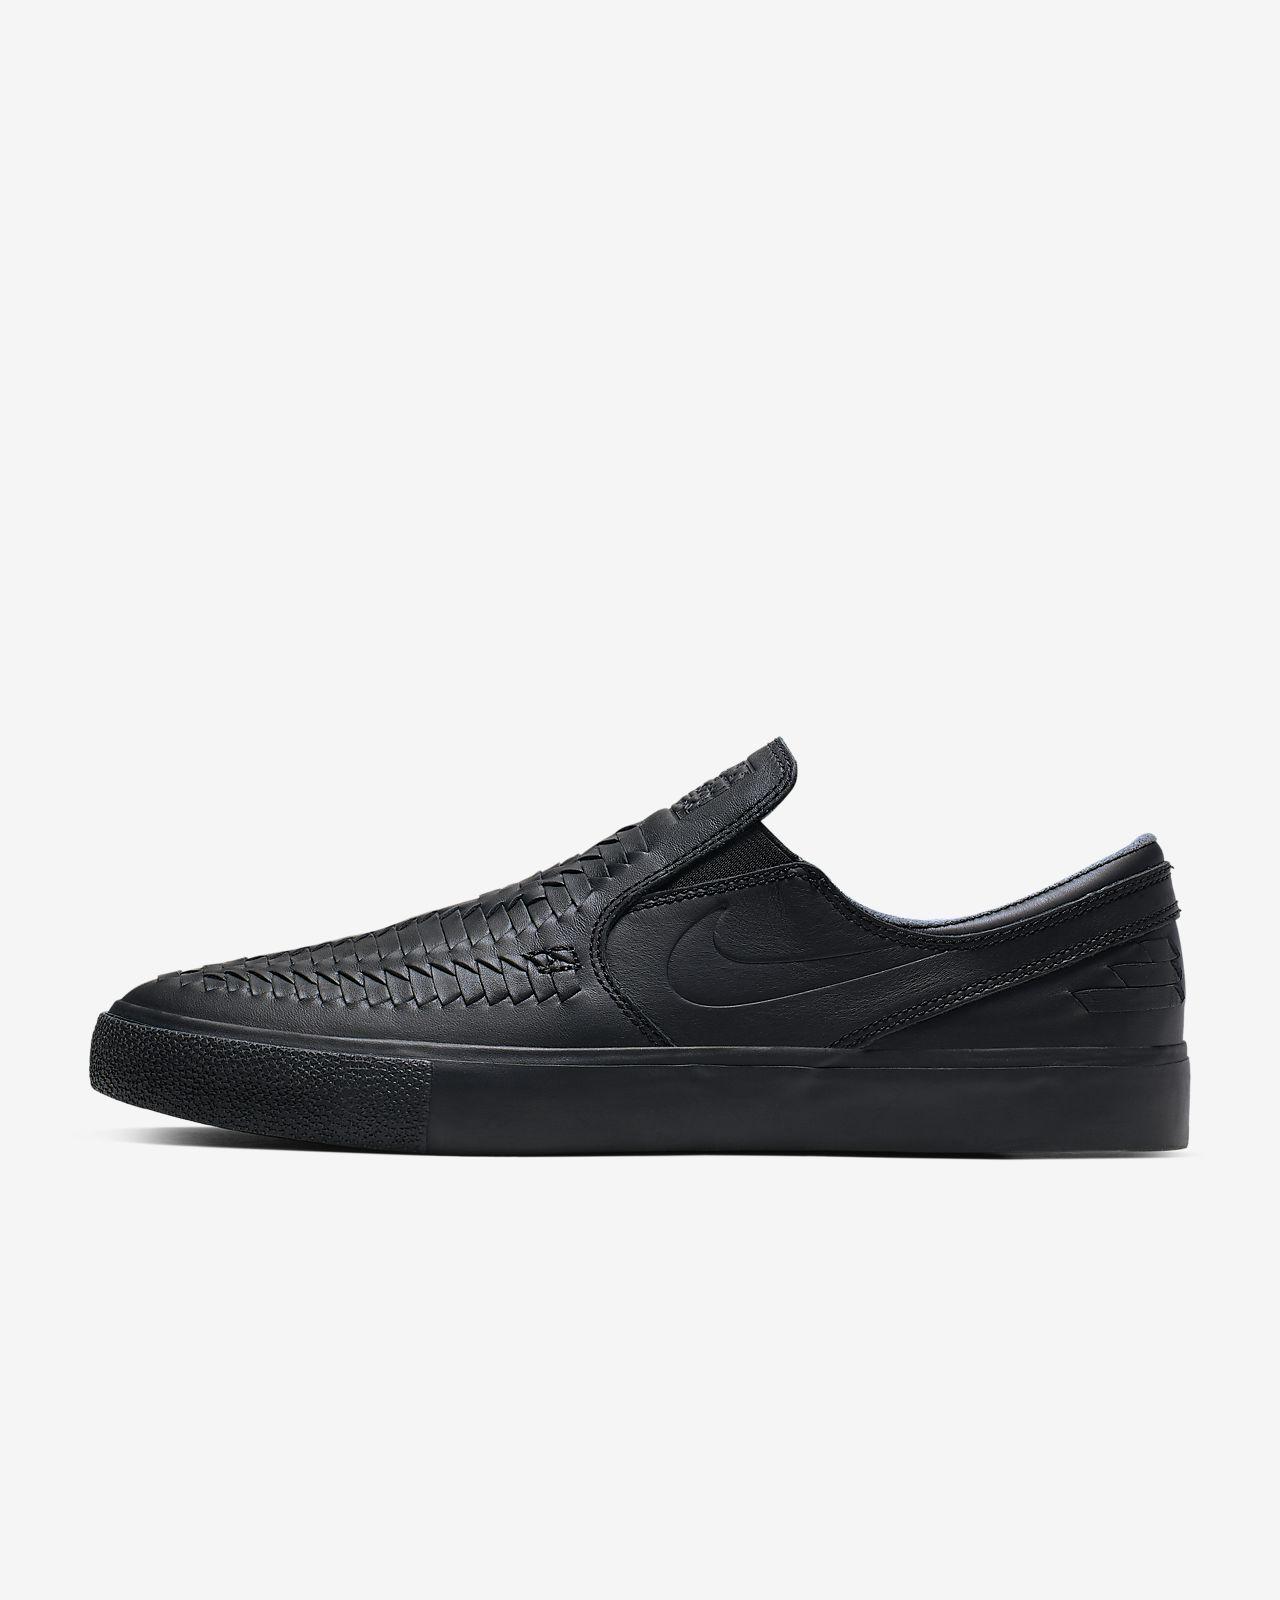 Chaussure de skateboard Nike SB Zoom Stefan Janoski Slip RM Crafted